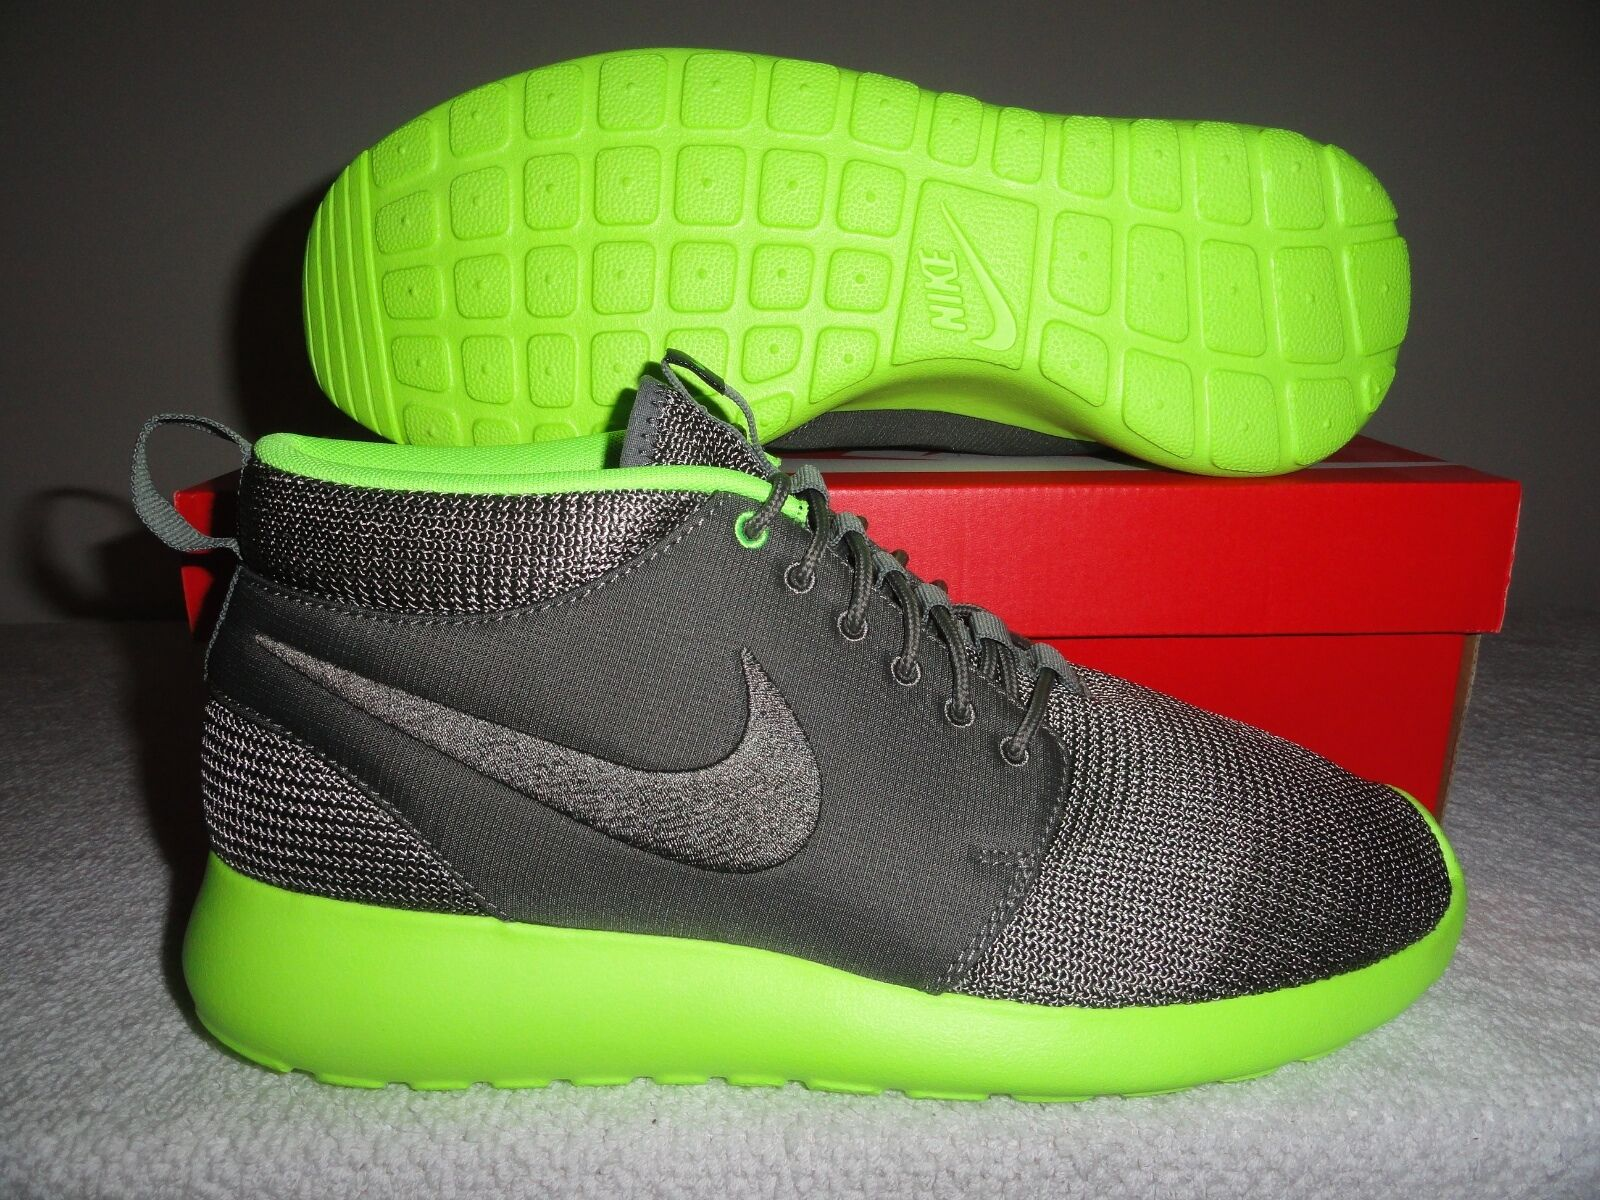 Nike Rosherun Mid Men's Running Sneakers 10 (New)